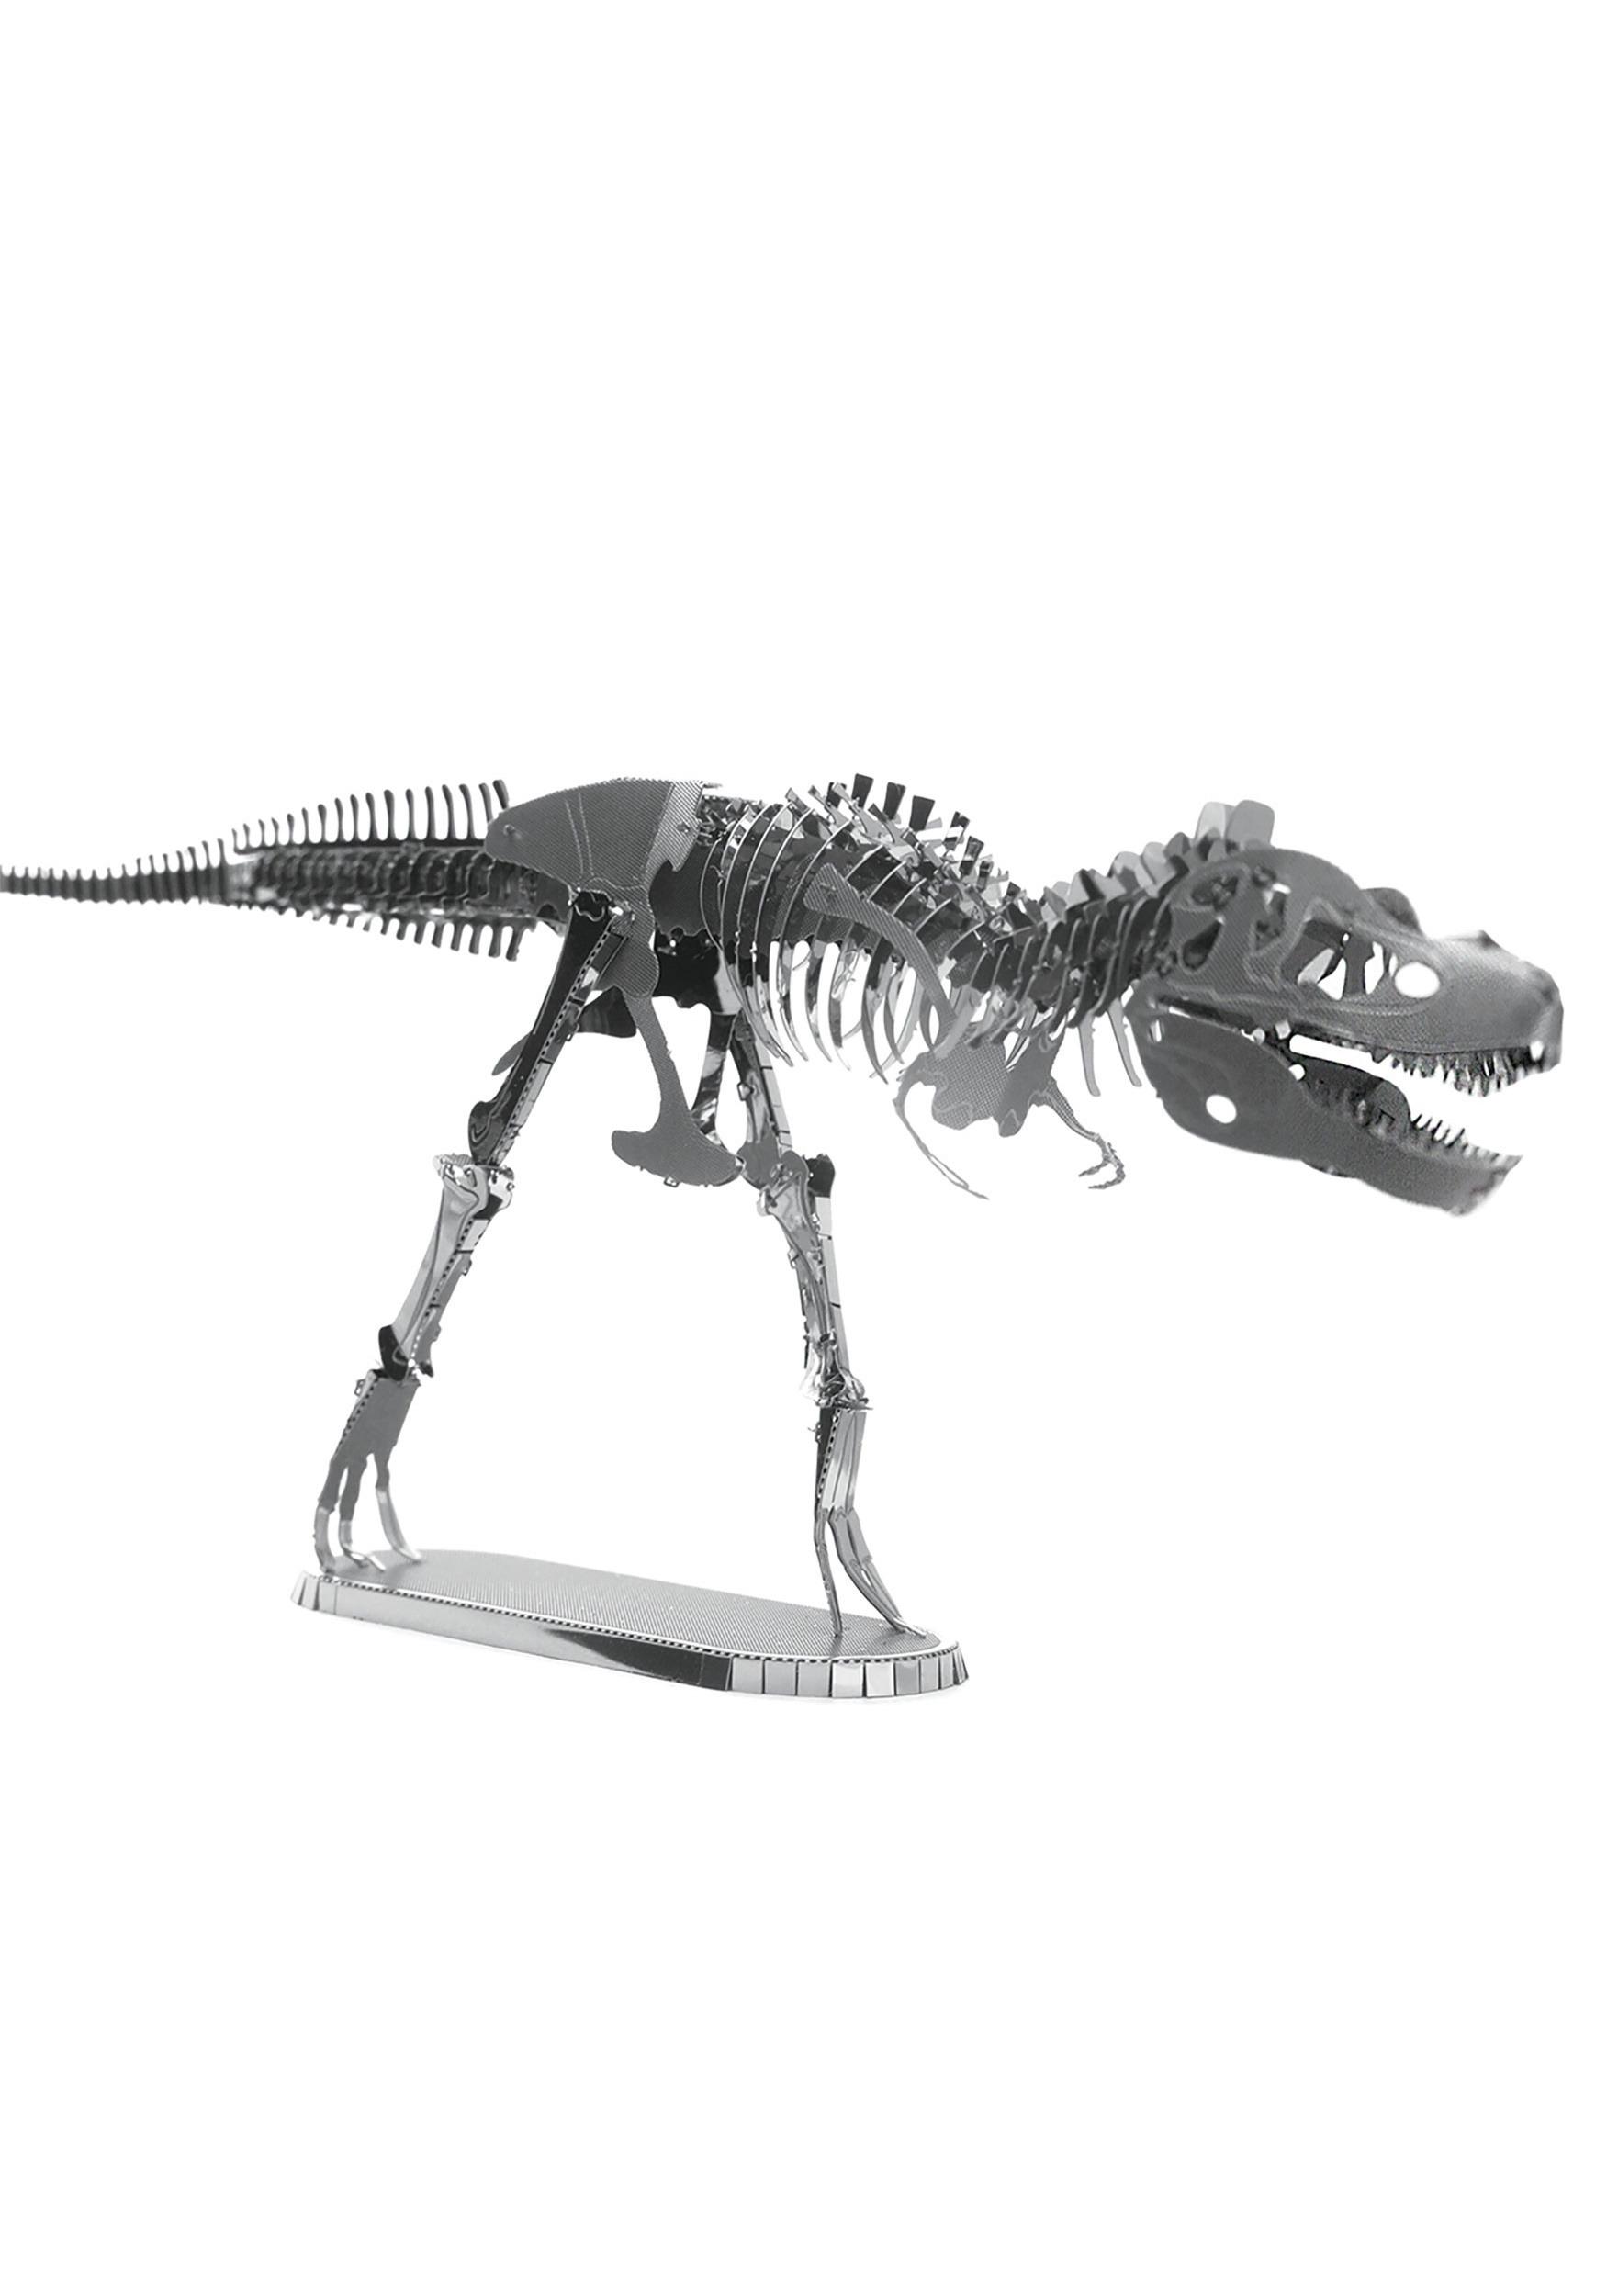 Tyrannosaurus Rex Metal Earth Model Kit